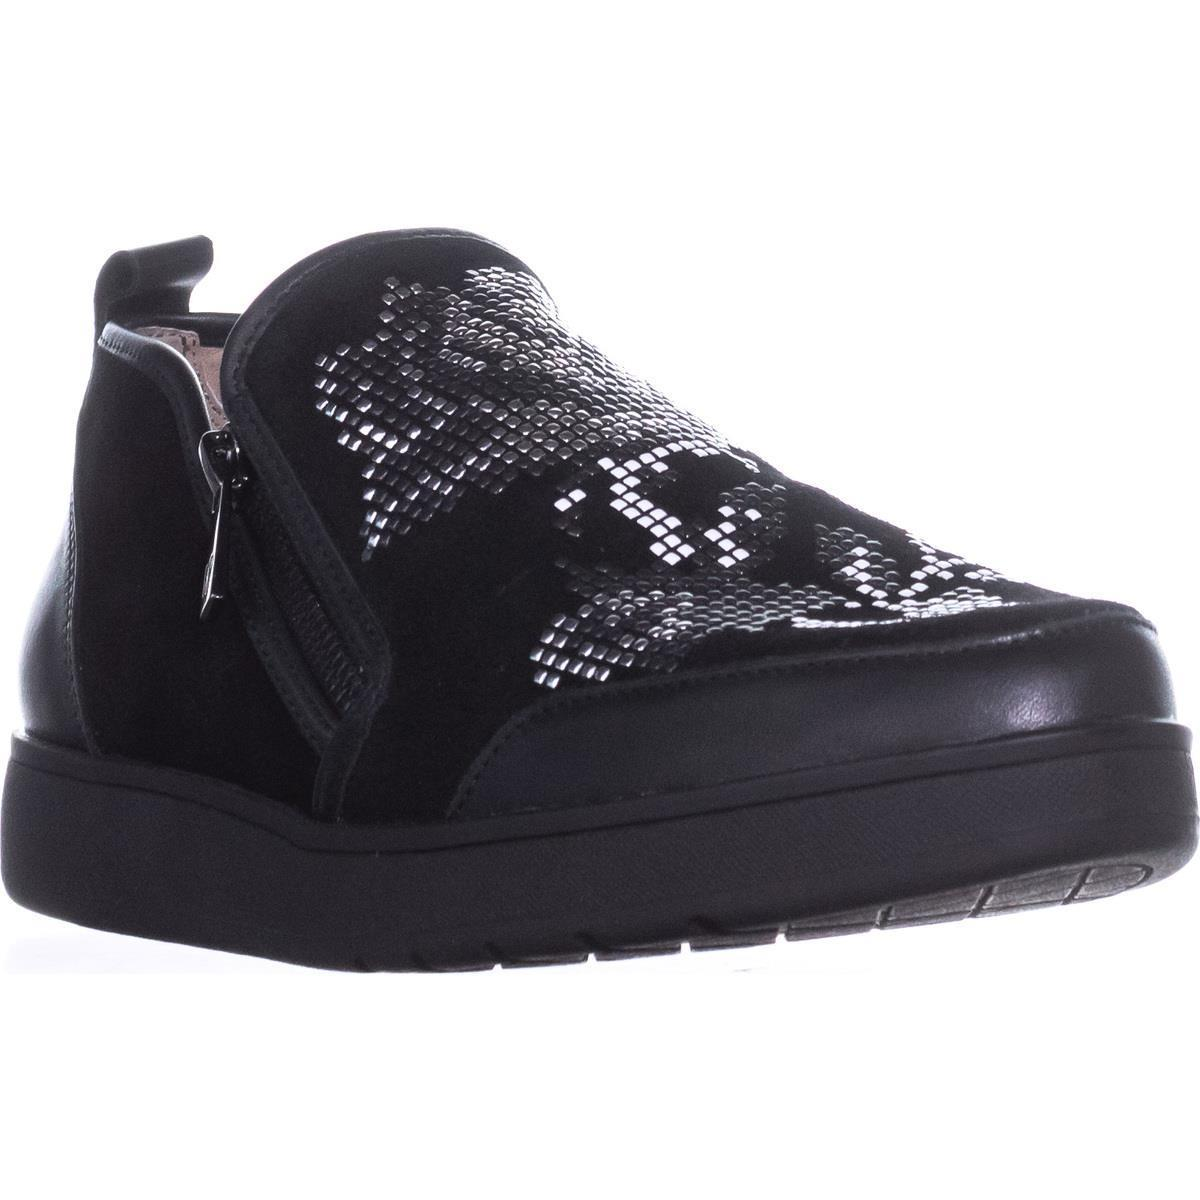 Womens Donald J Pliner Mylasp Slip-on Fashion Sneakers, Black Suede by Donald J Pliner